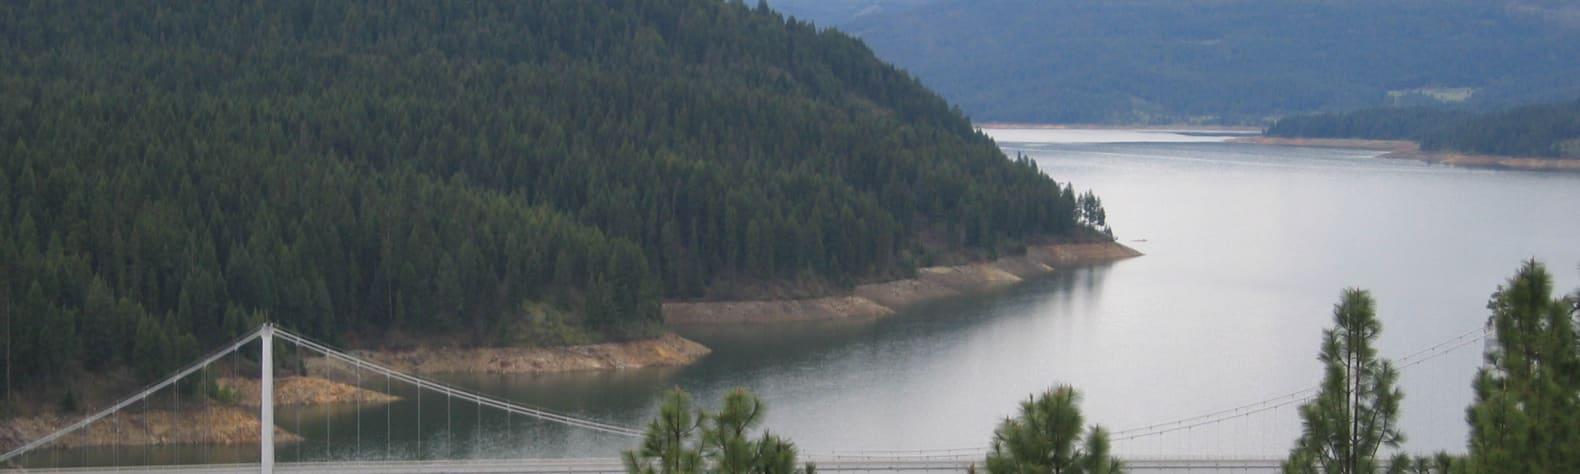 Dworshak Reservoir